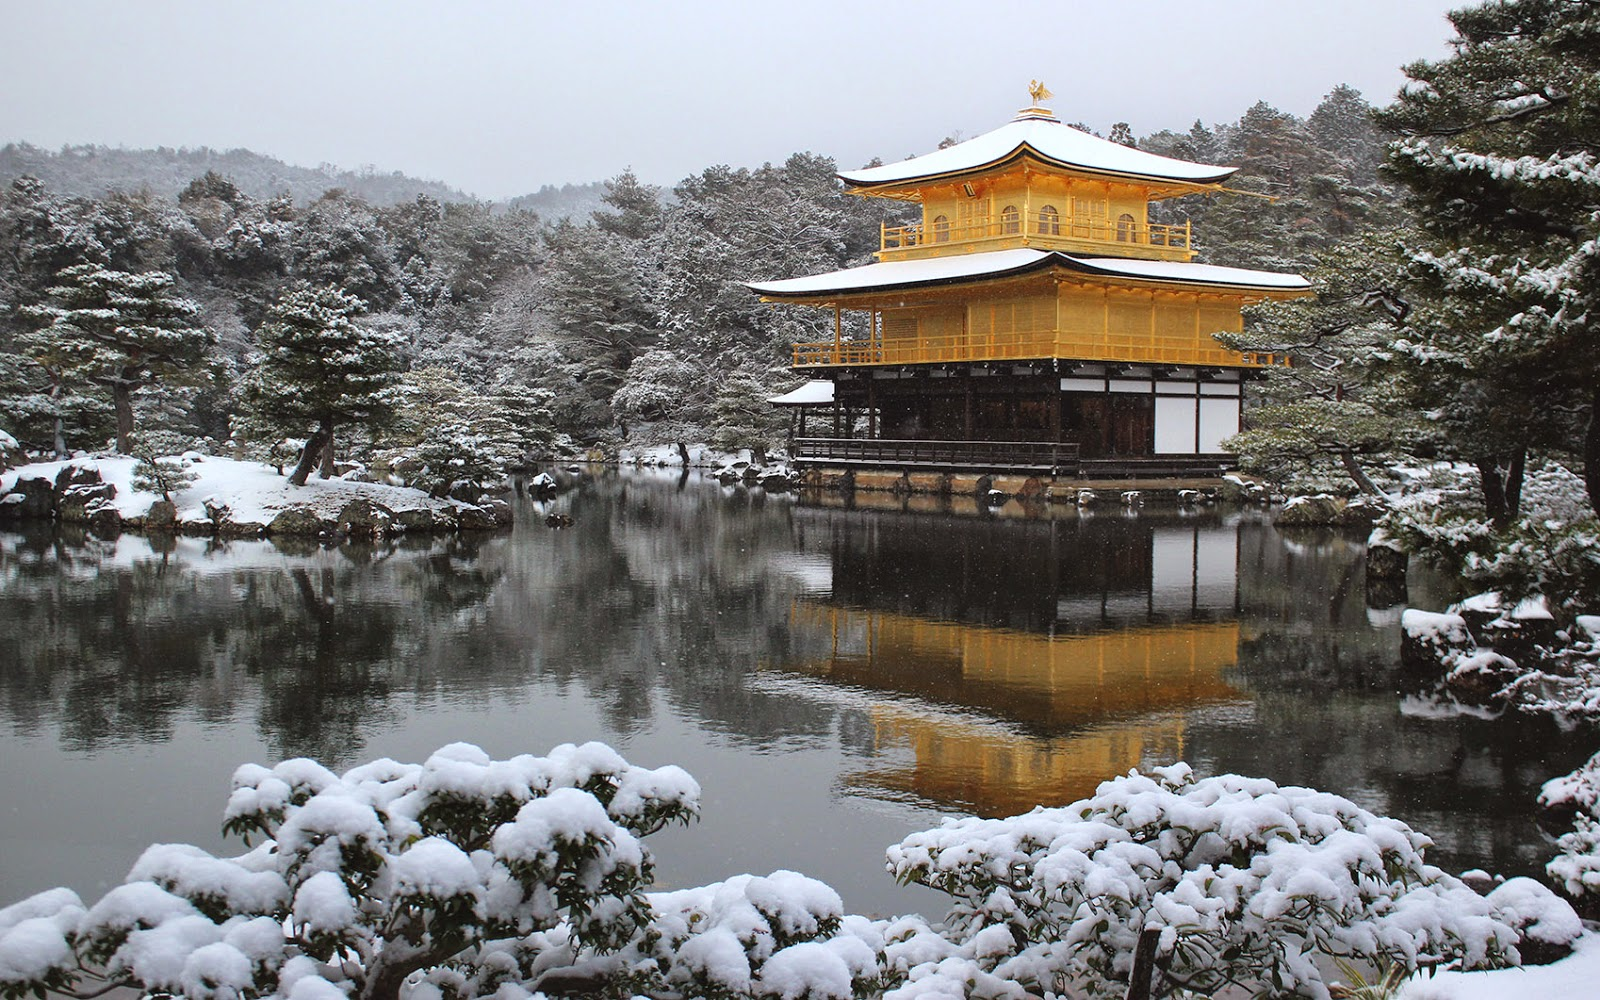 Путешествие в Киото в декабре и отзыв об опции Everywhere от Orange